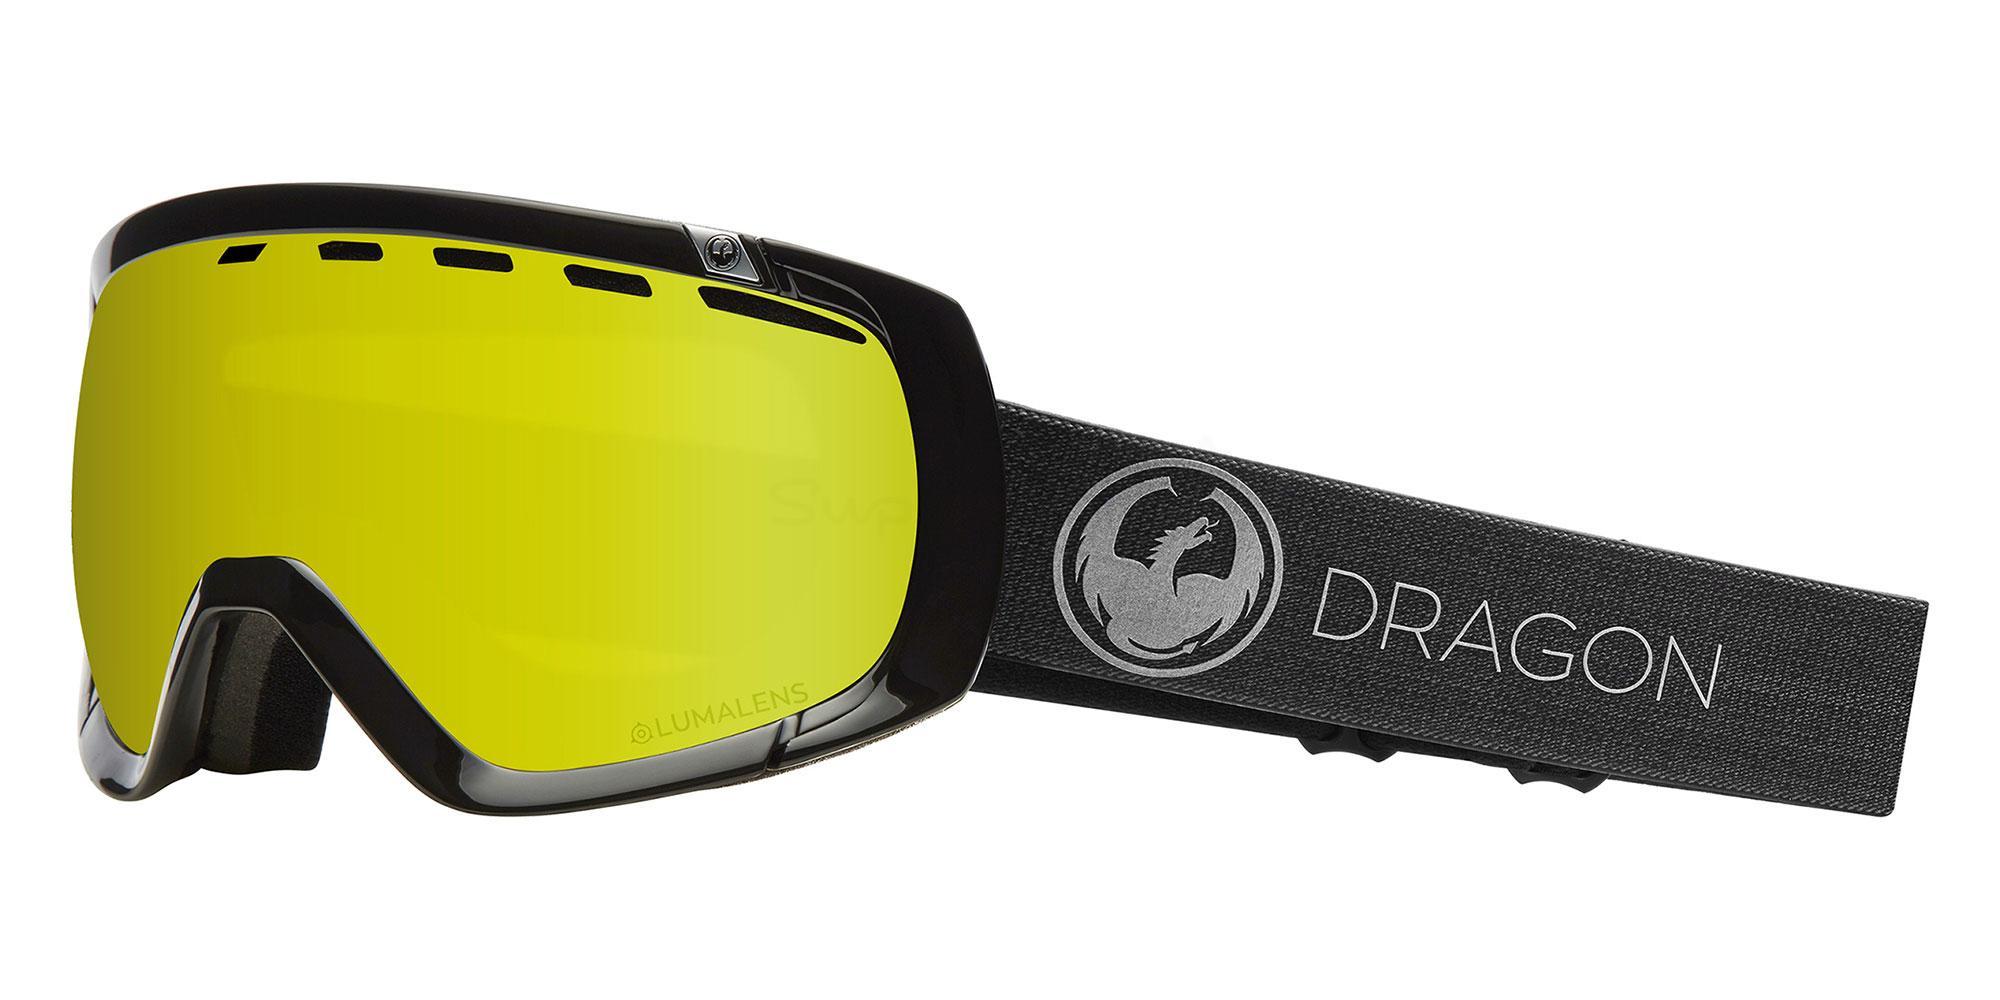 338 DR ROGUE NEW PH Goggles, Dragon